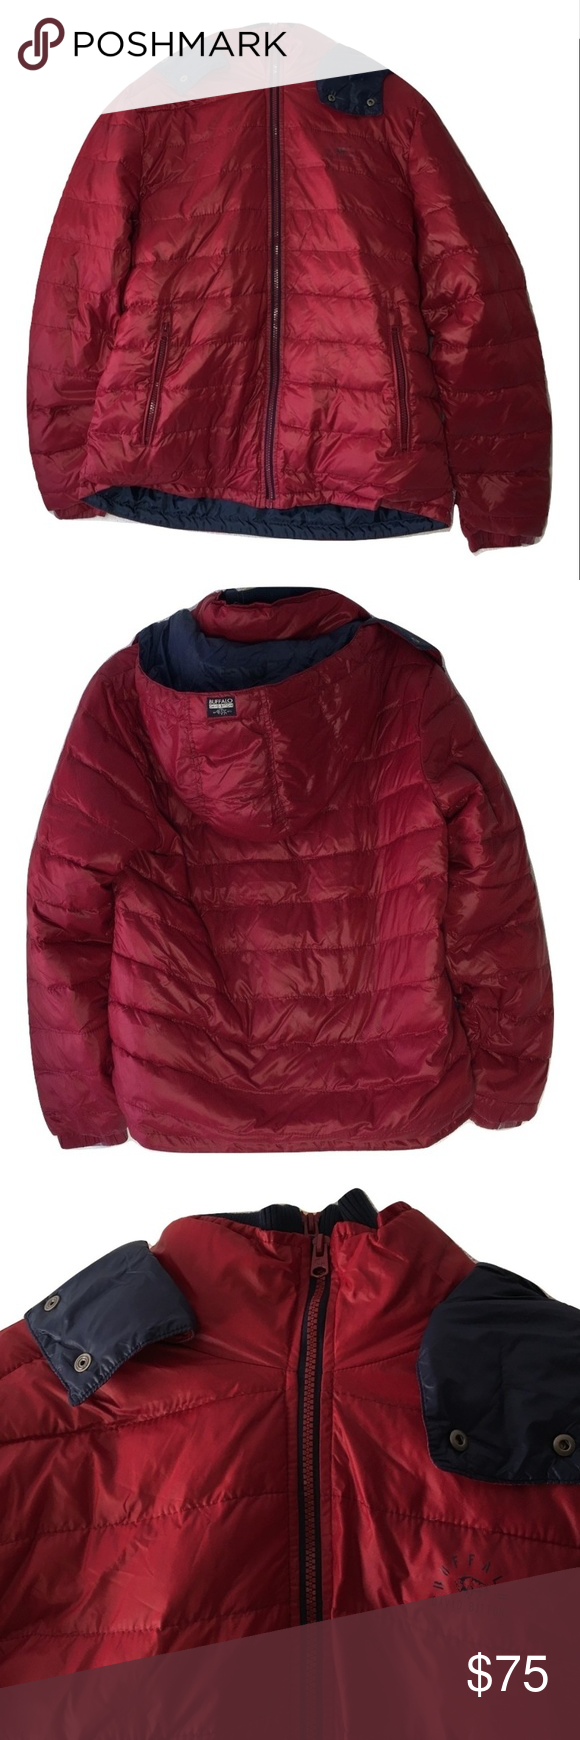 Buffalo David Bitton Juggles Down Feather Jacket Fashion Feather Jacket Clothes Design [ 1740 x 580 Pixel ]